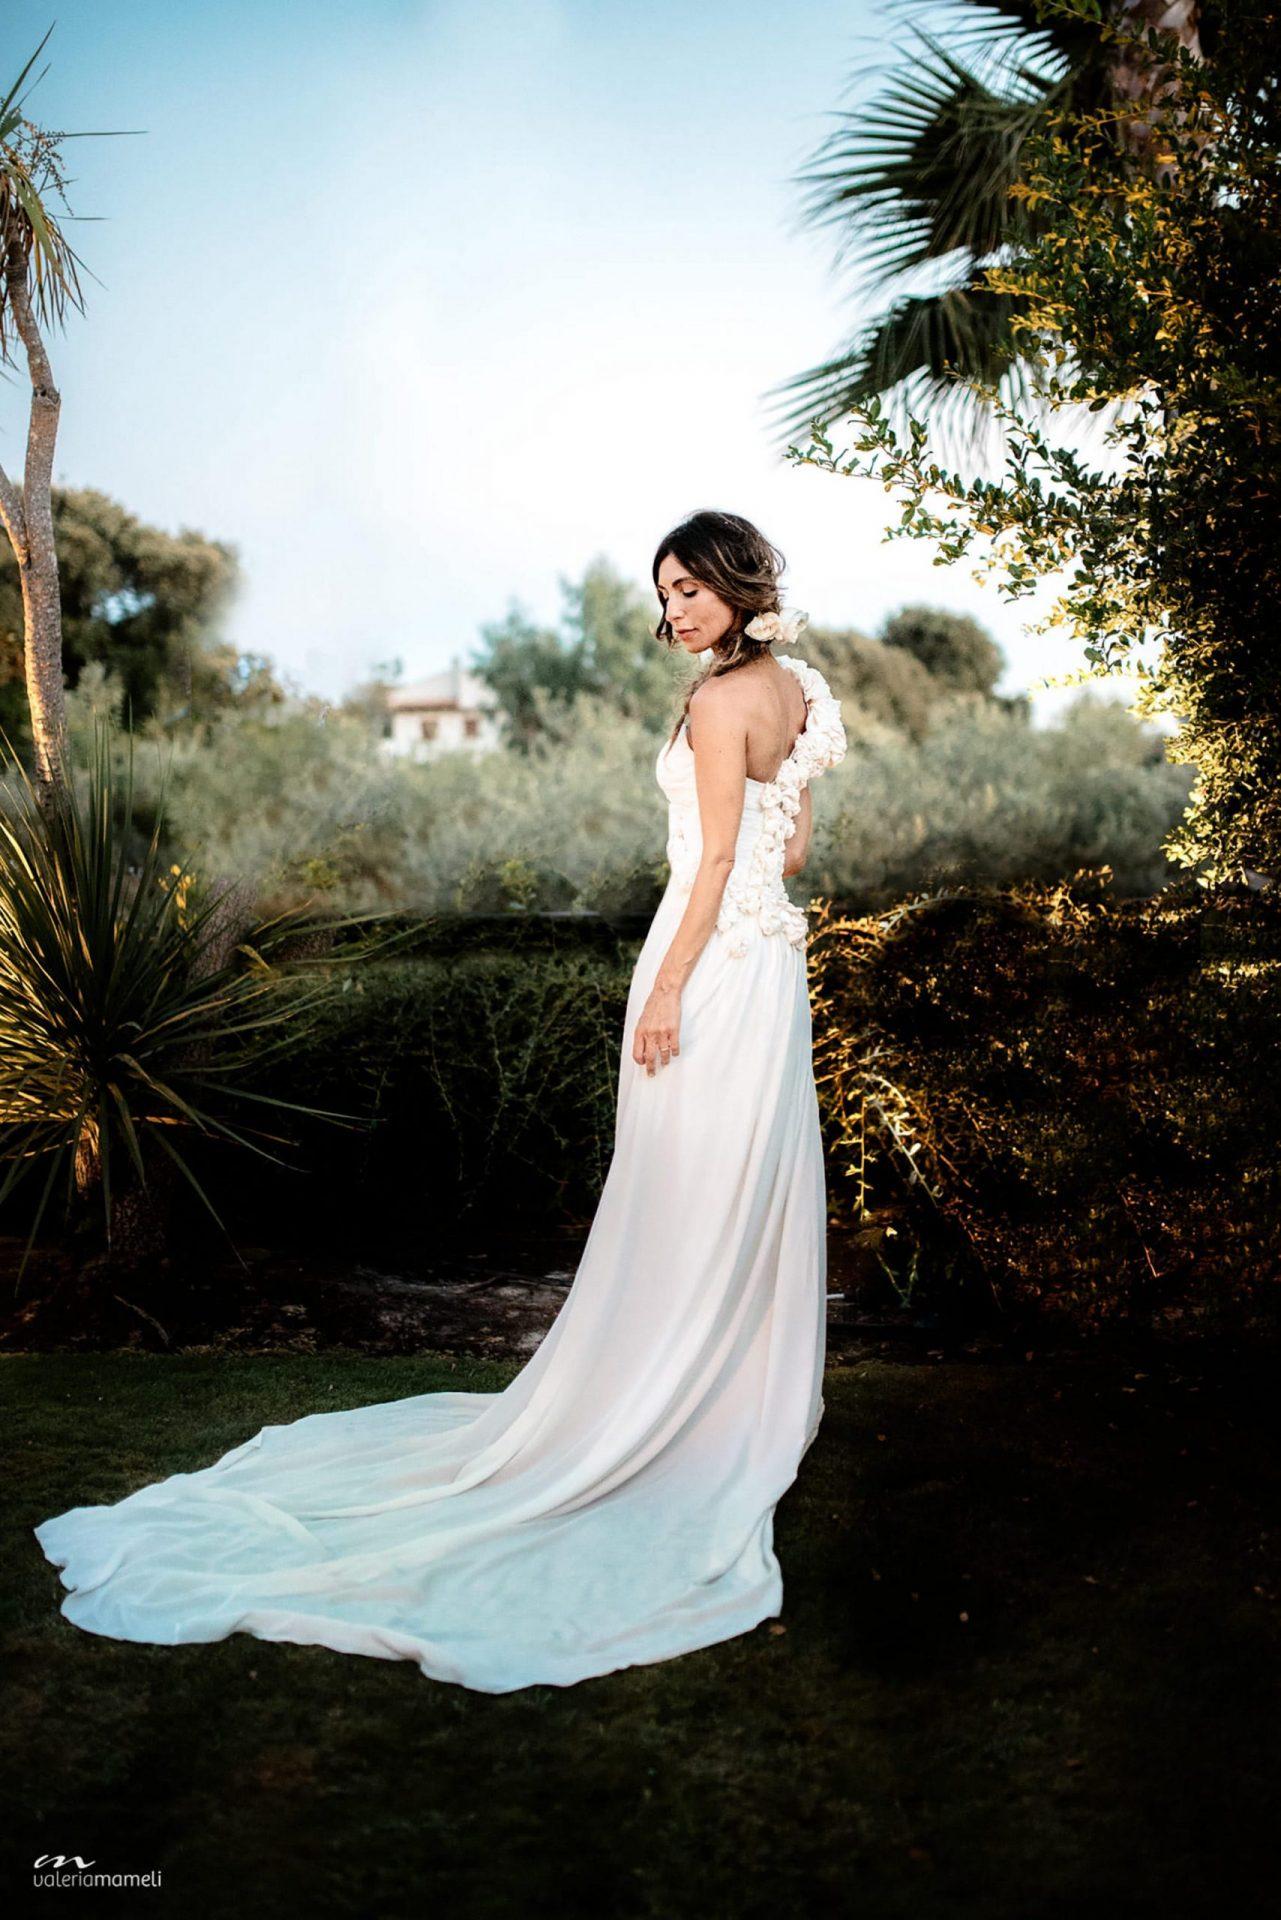 Francesca and Francesco, the bride